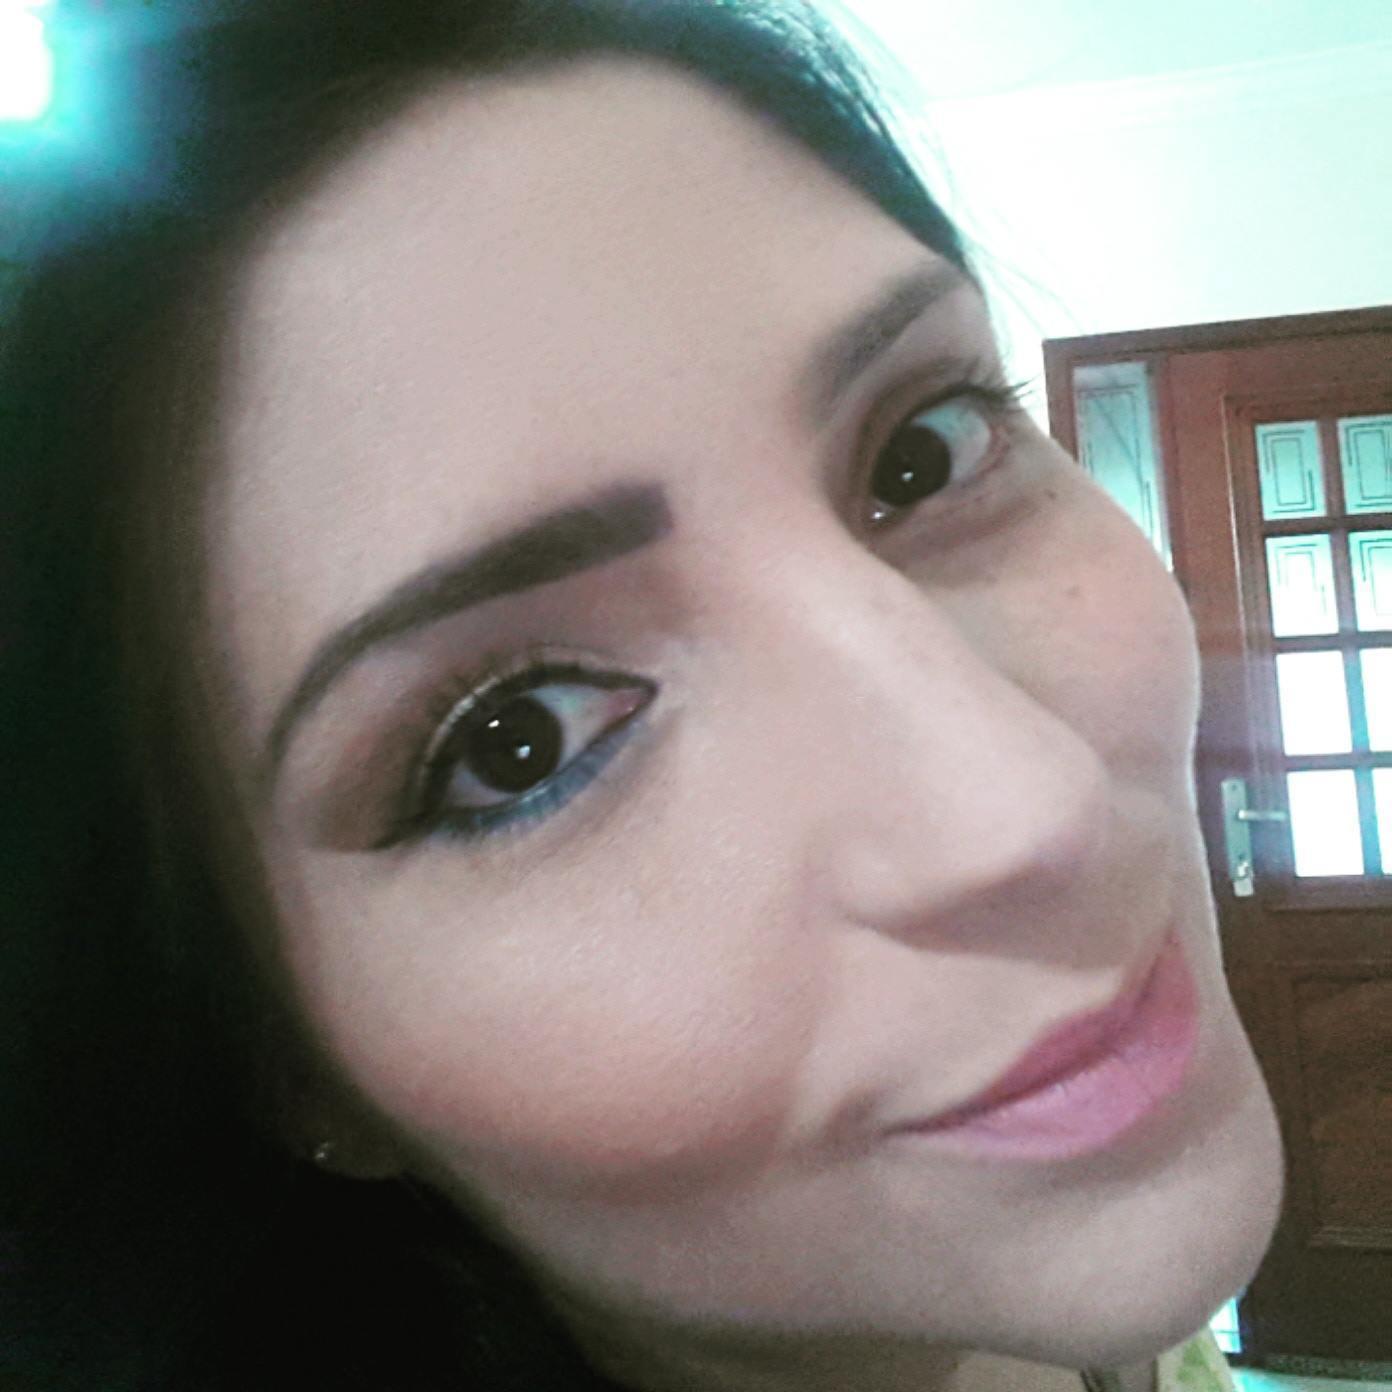 #Makeupbyfreitasmari #instamakeup #cosmedic #cosmedcs  #fashion #instagood #beautiful  #maquillaje #linda #festa #debutante #madrinha #social #noiva #balada #antesedepois  maquiador(a)